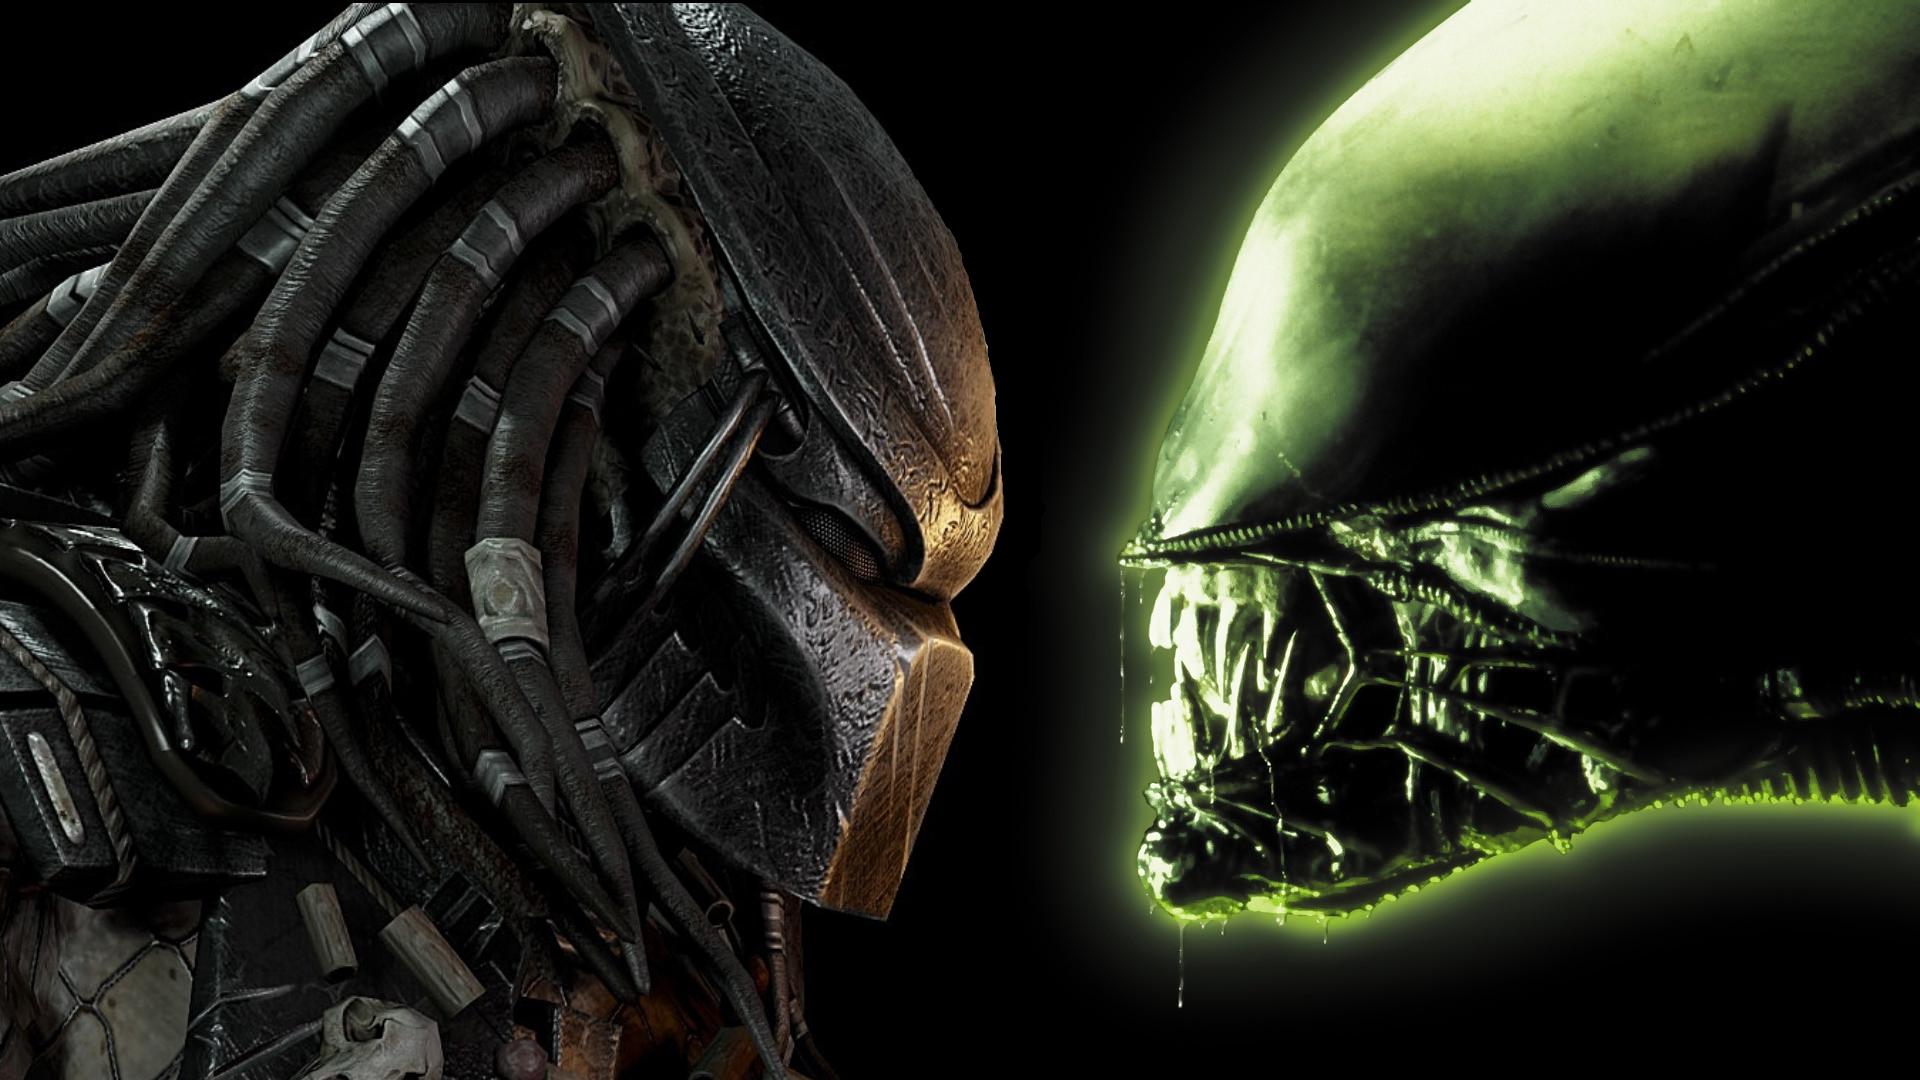 Alien versus Predator in the world of Artificial Intelligence